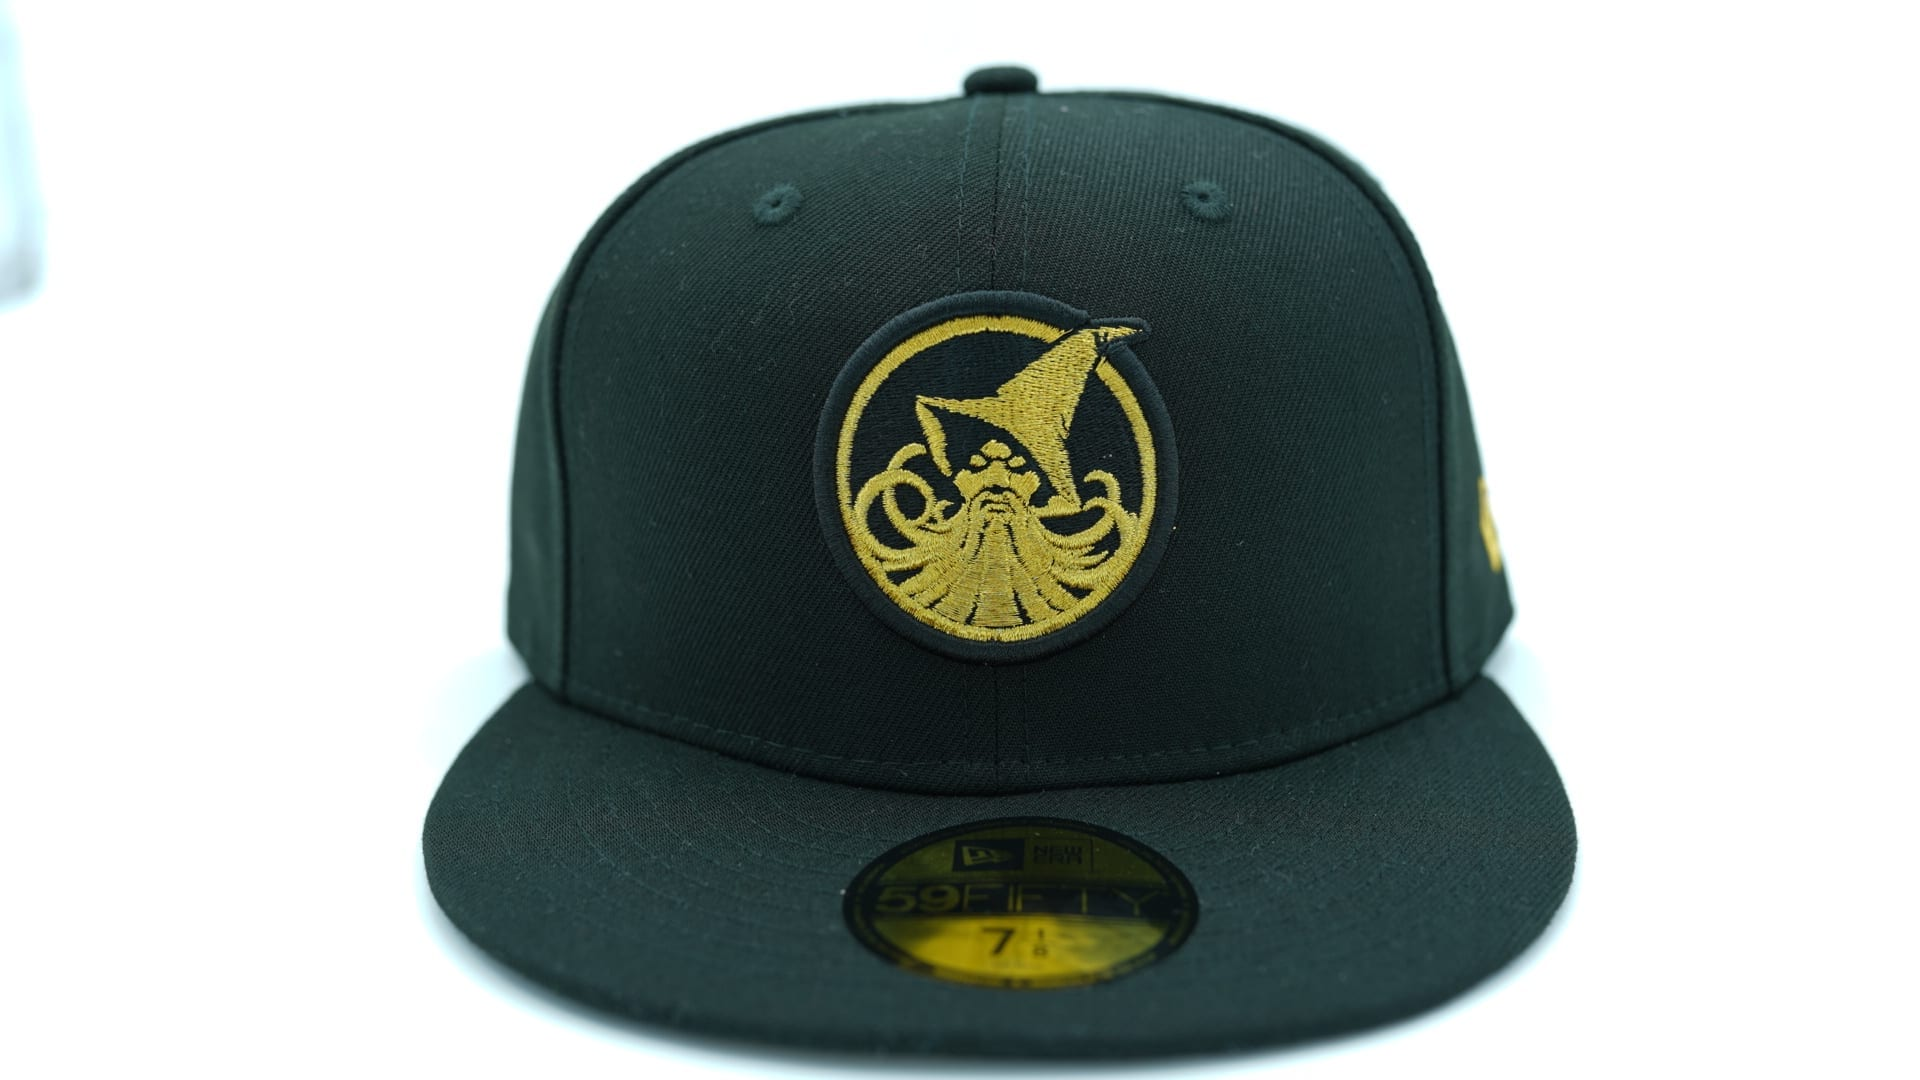 mnl sta ana fitted baseball cap wip caps